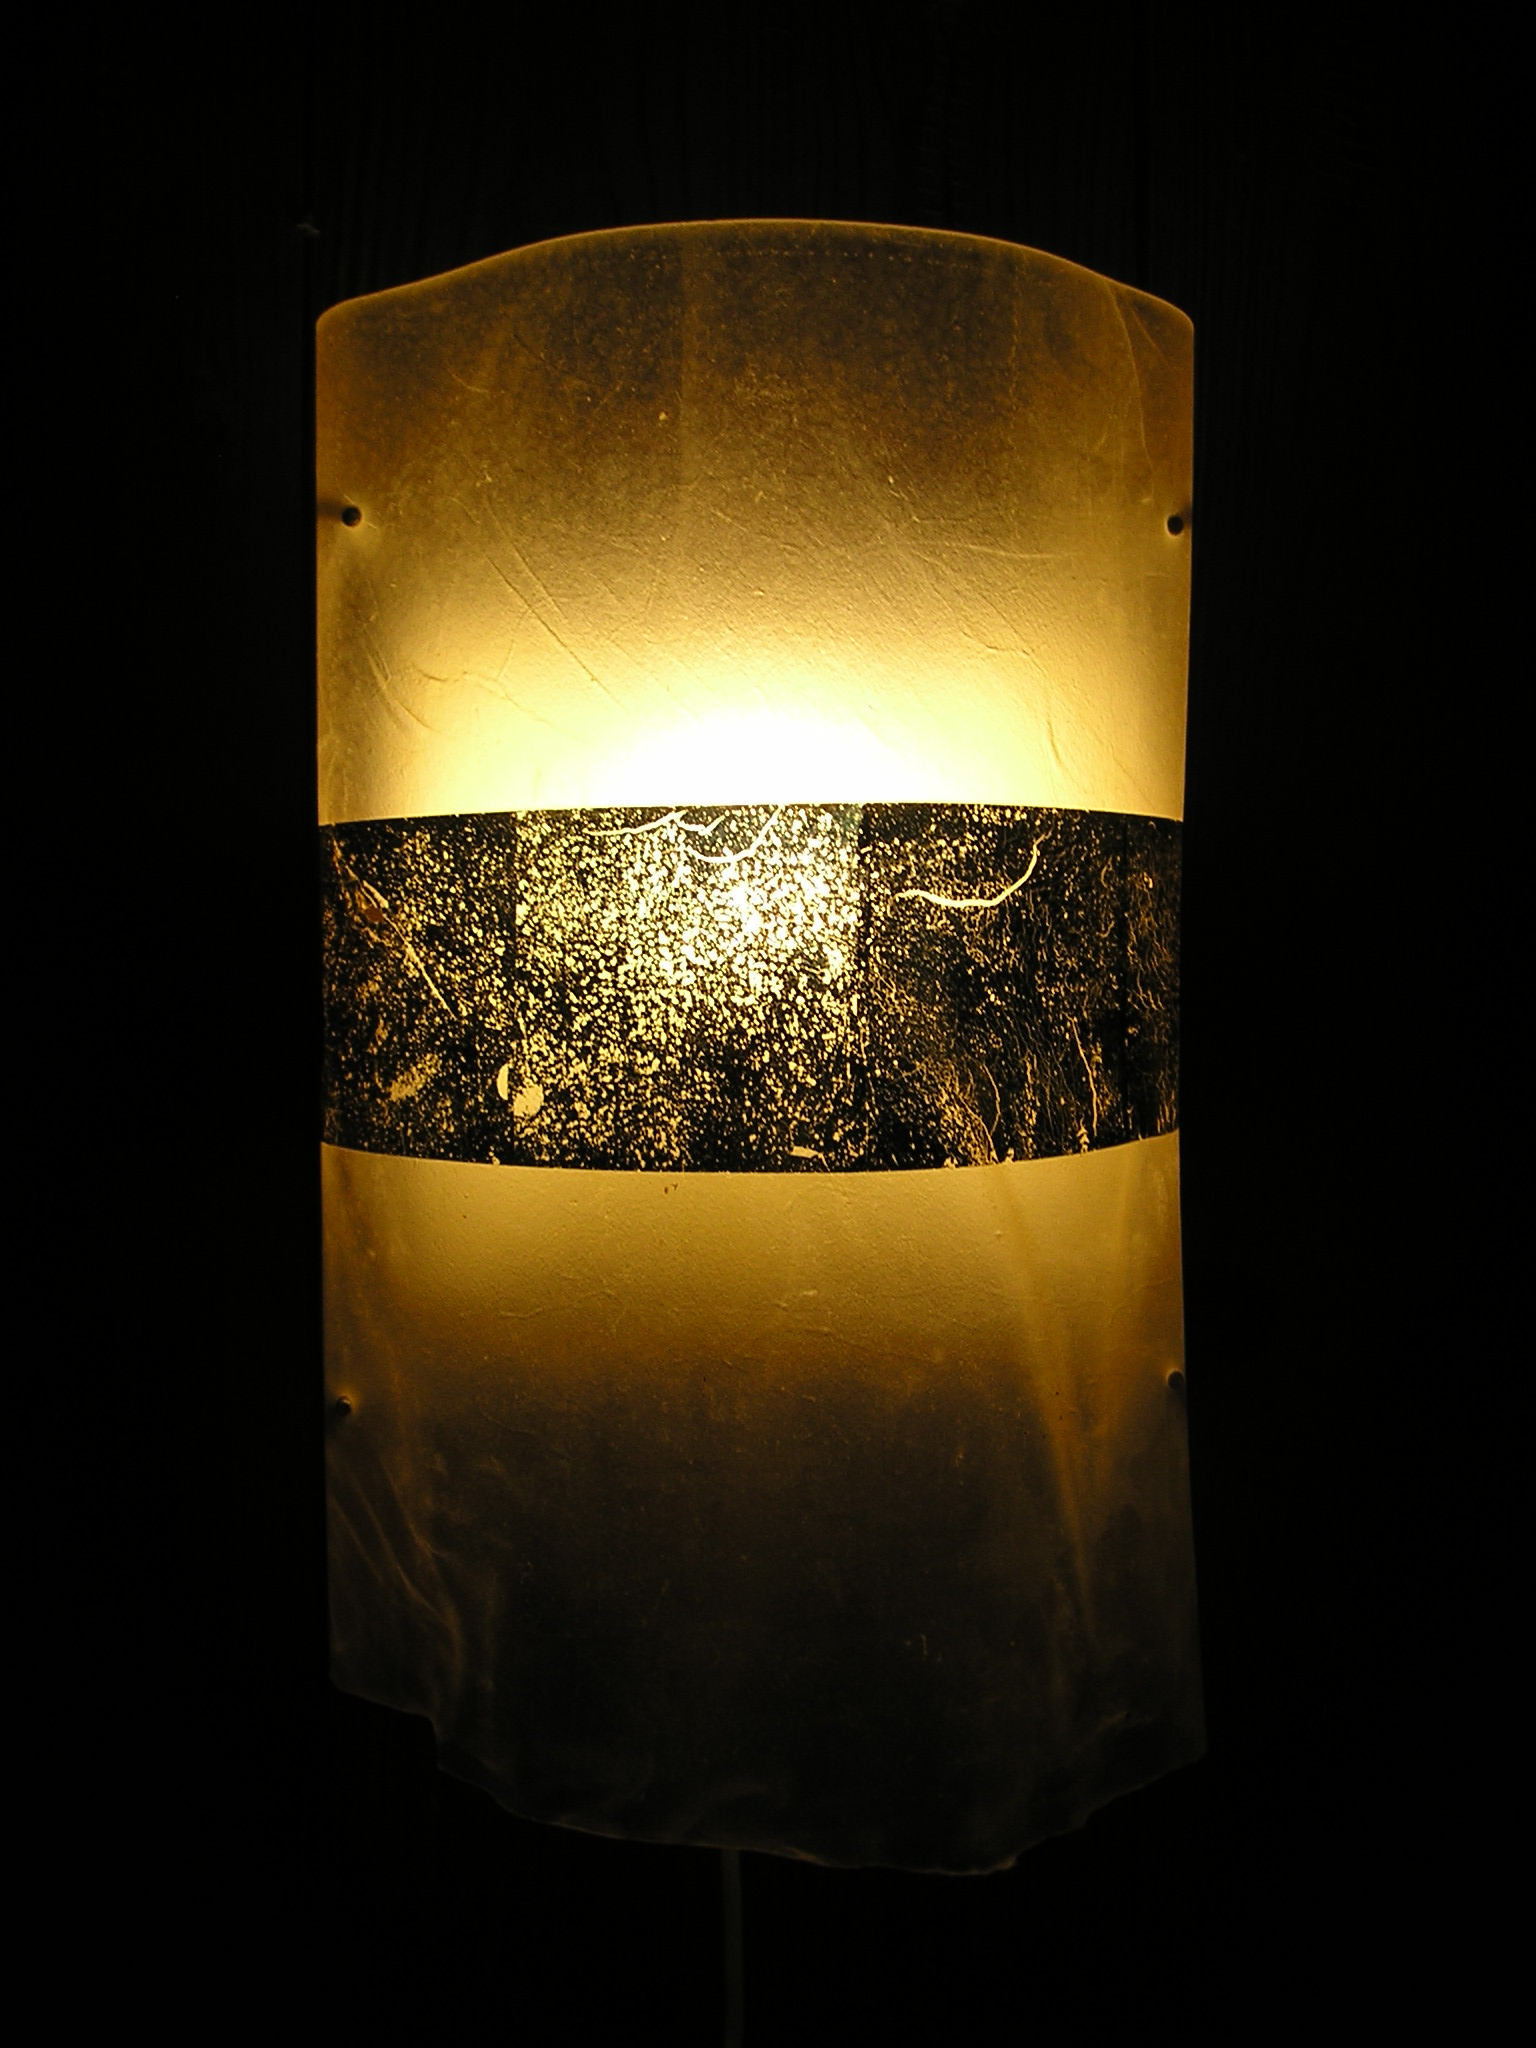 Wandlampe Kalbspergament mit Blattgold Euro 150.-